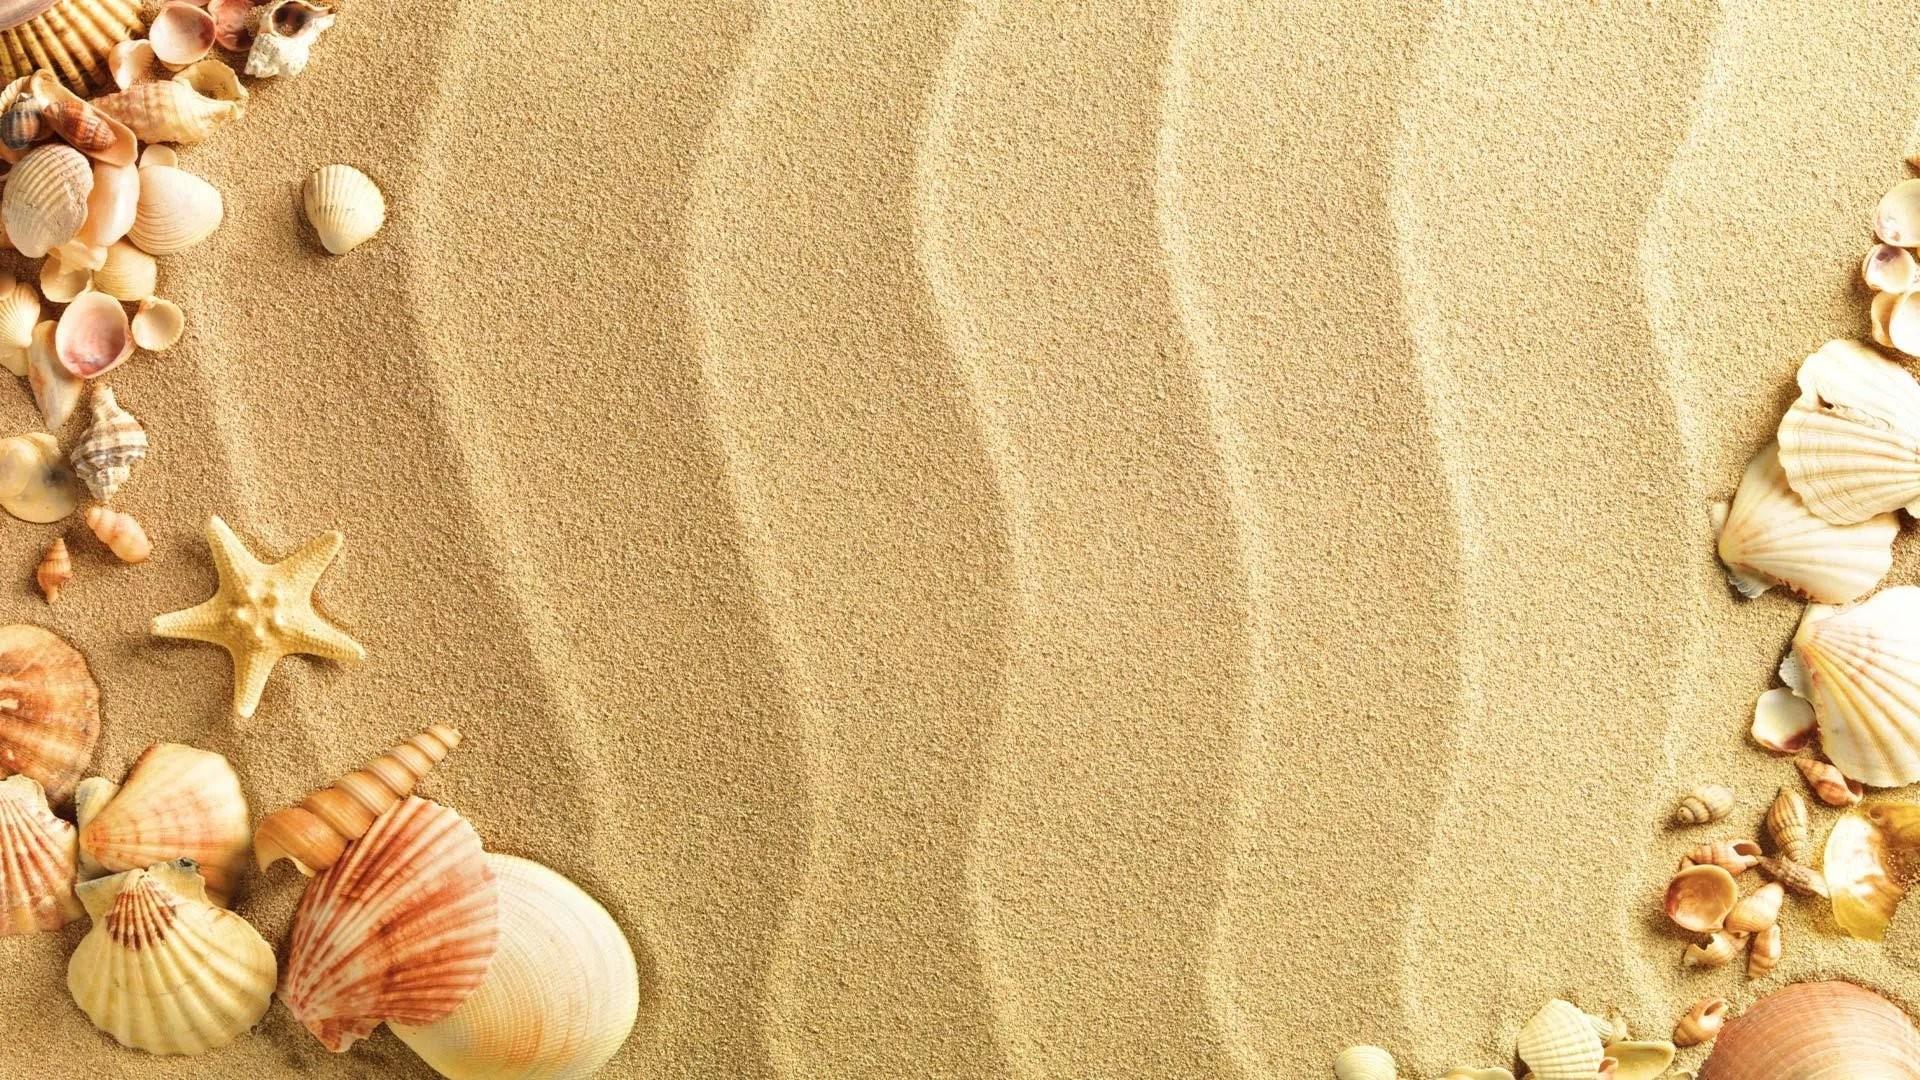 Seashell Backgrounds (43+ Images